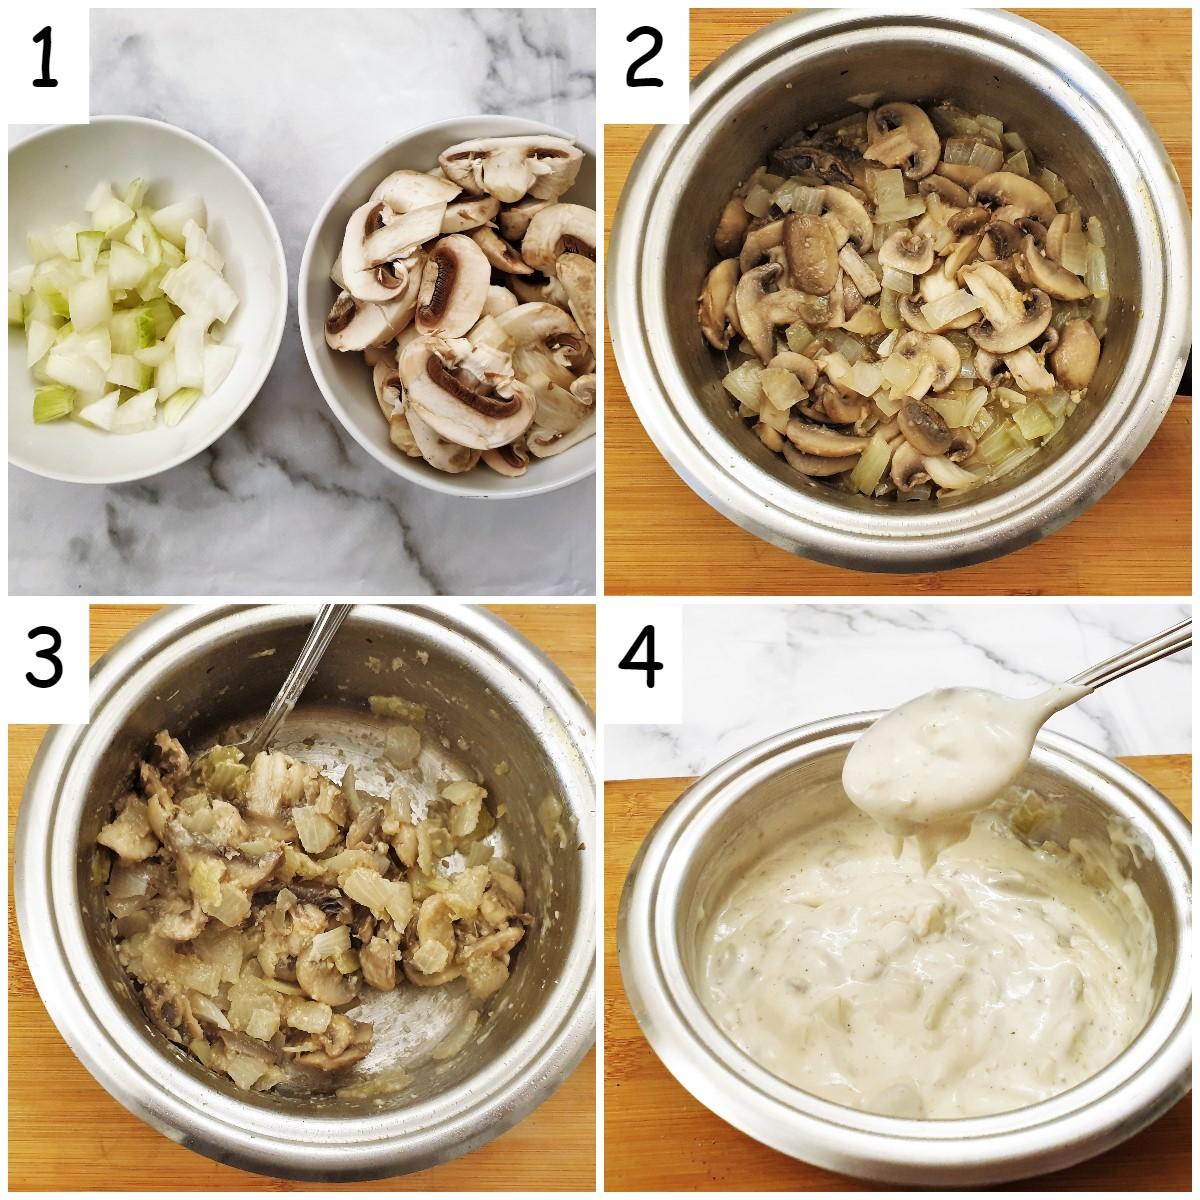 Steps for making creamy mushroom sauce.